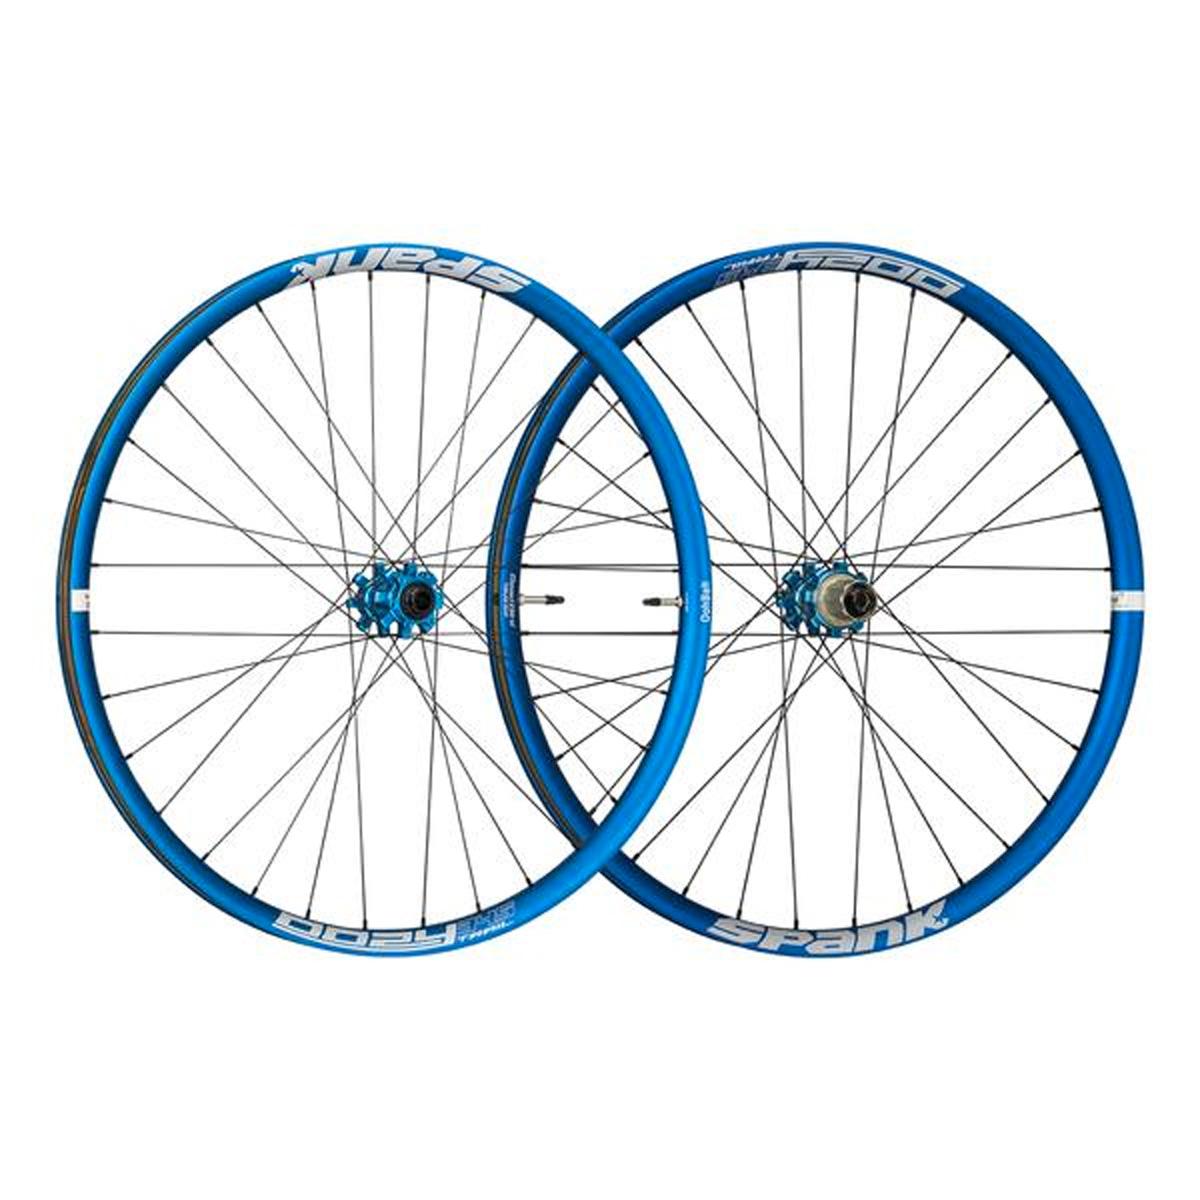 Spank OOZY Trail 345 Boost Bicycle Wheelset